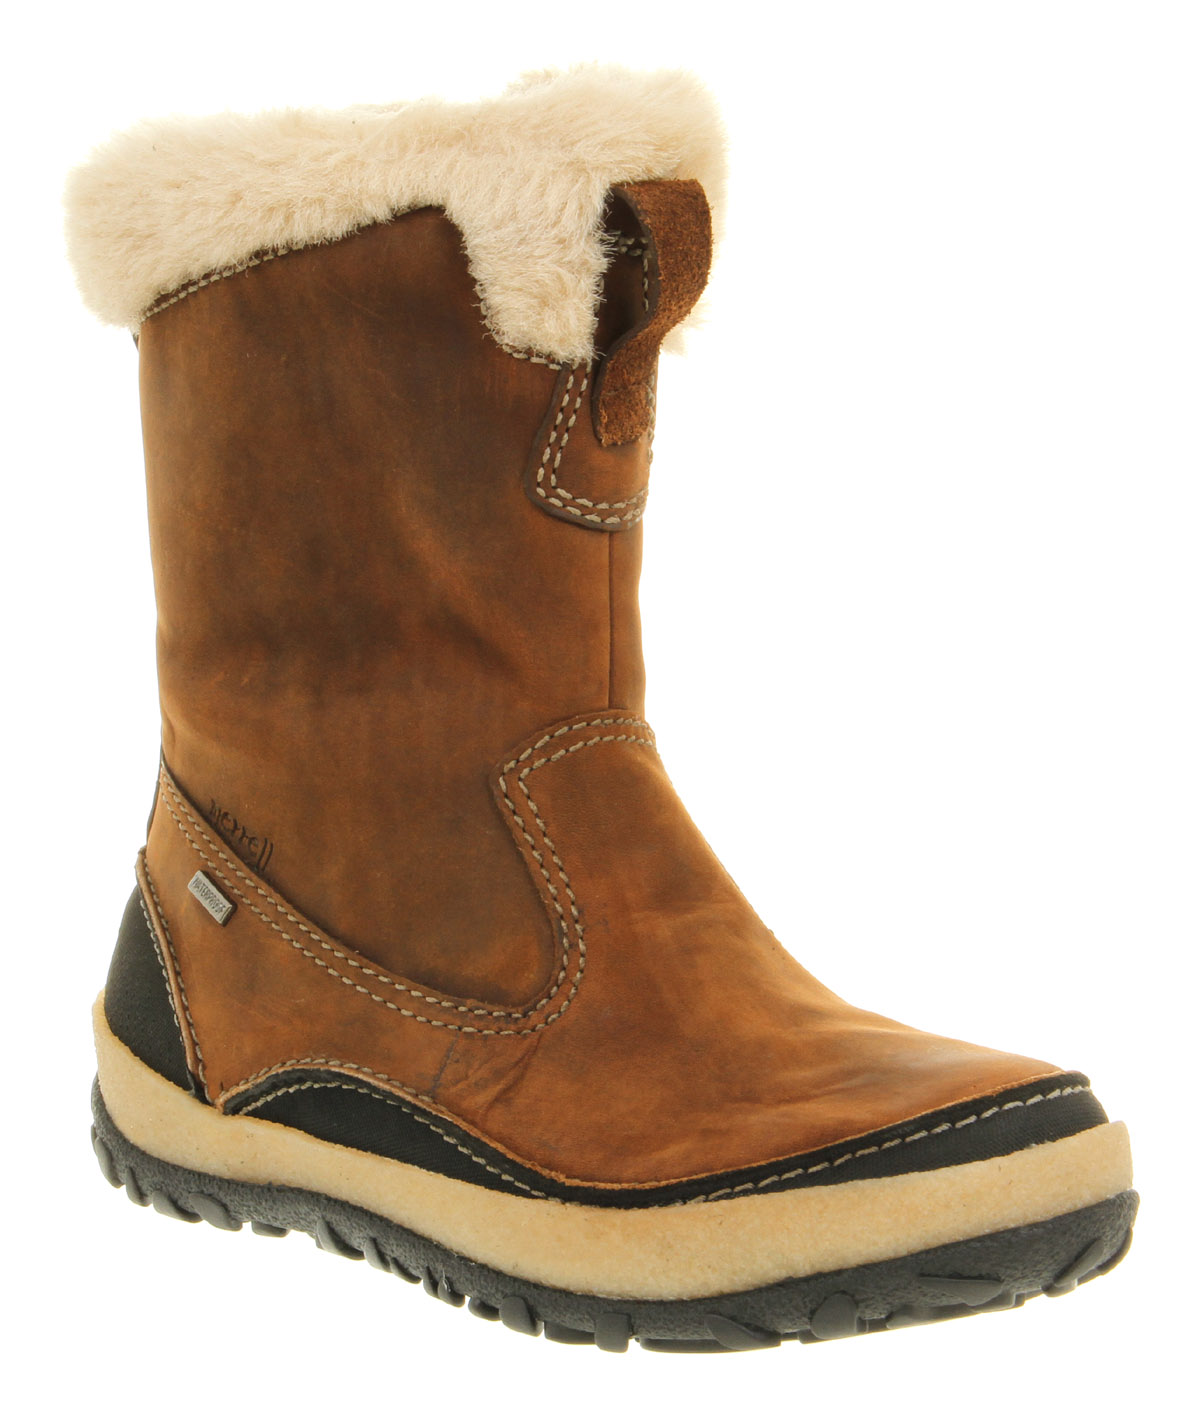 Clothes, Shoes & Accessories > Women s Shoes > Boots